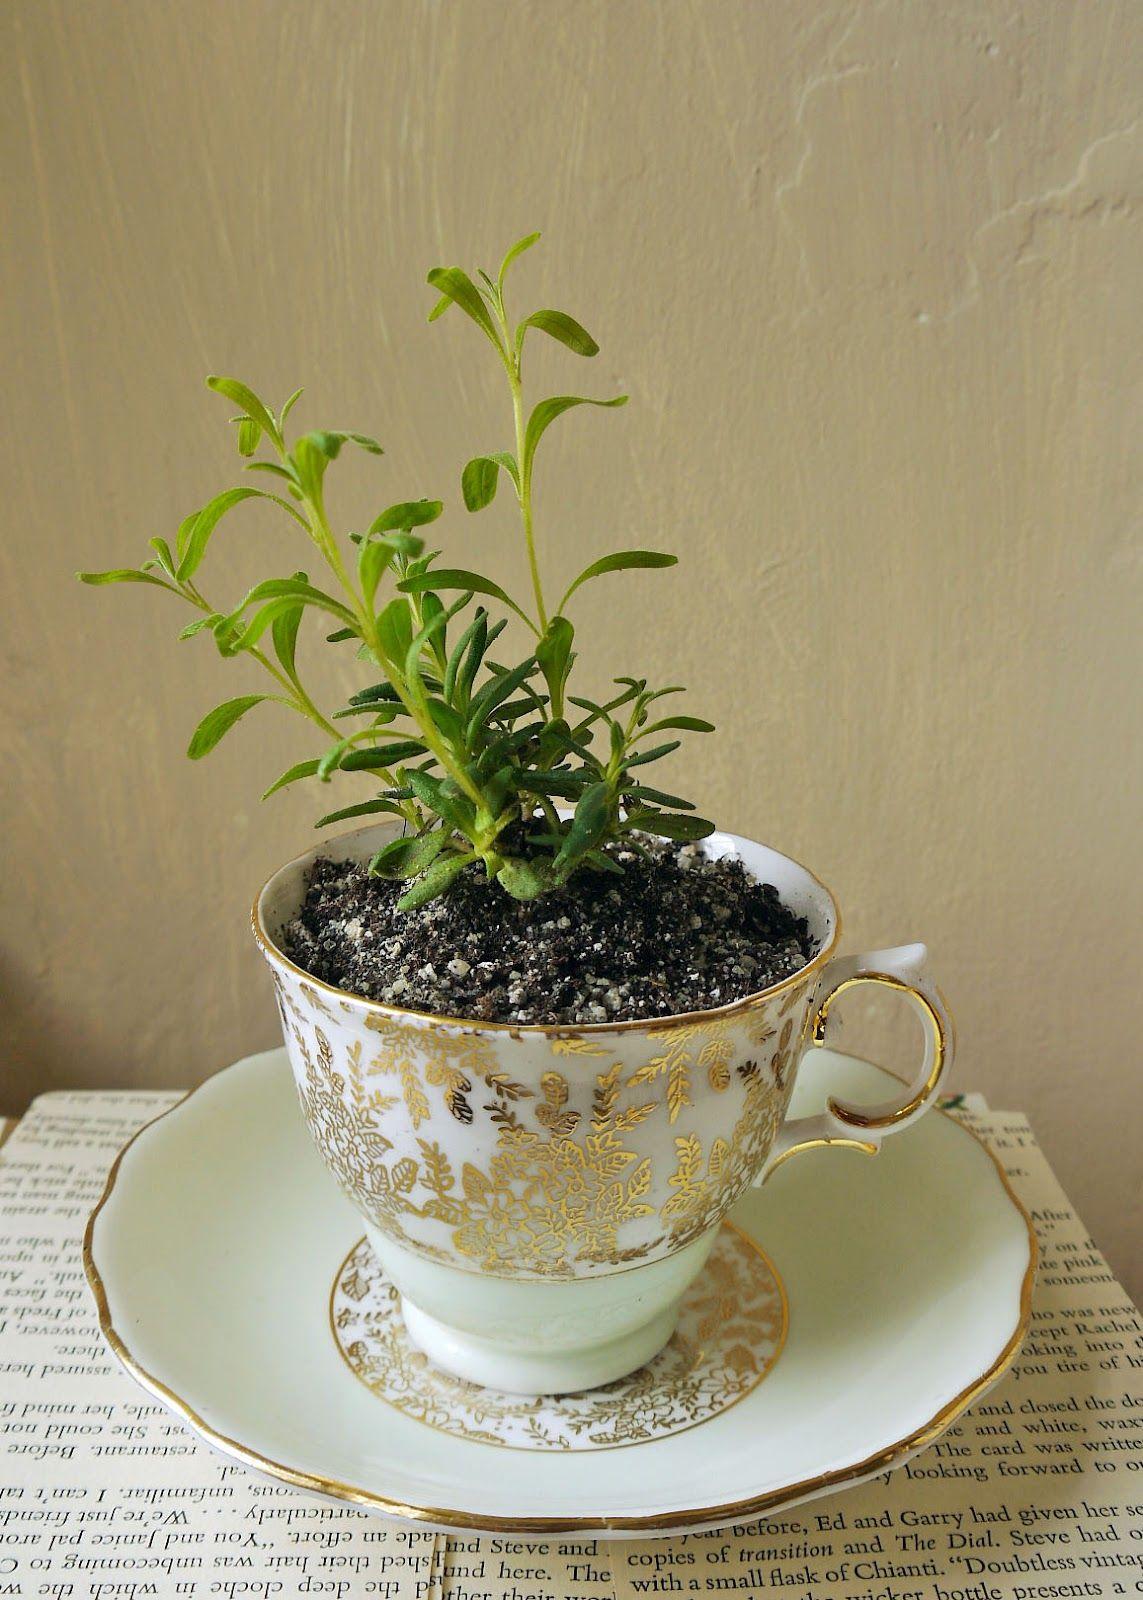 how to grow mint indoors uk